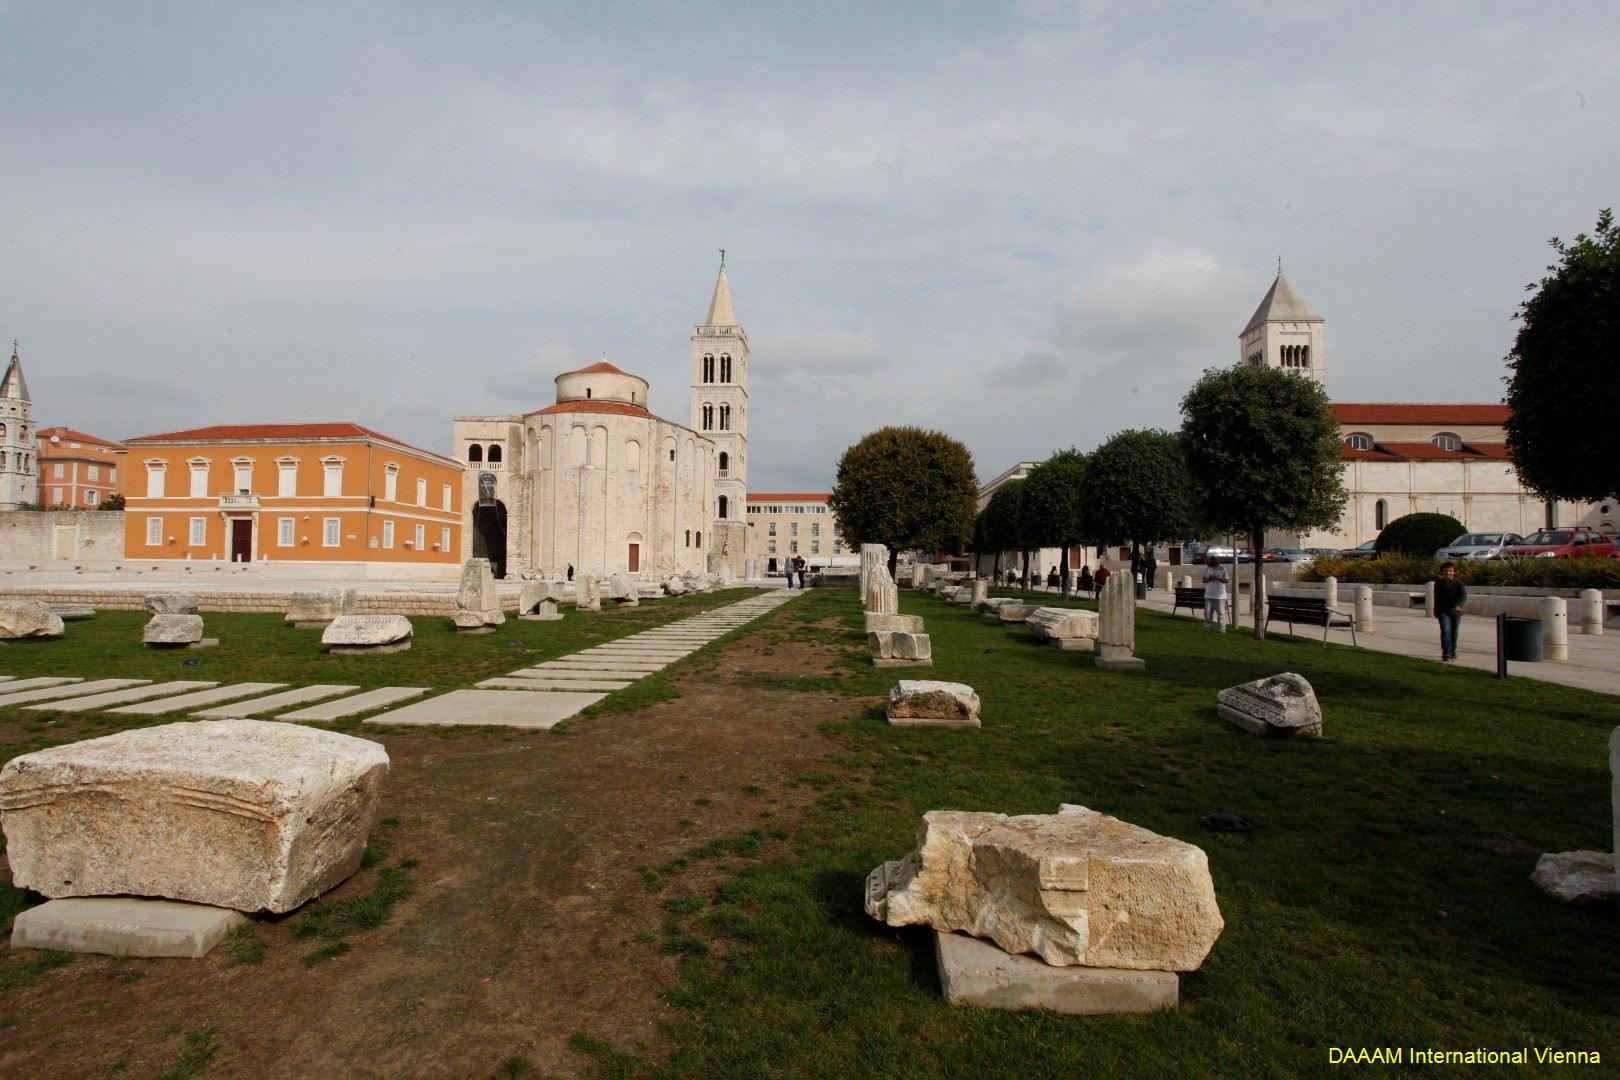 DAAAM_2012_Zadar_00_Zadar_City_036